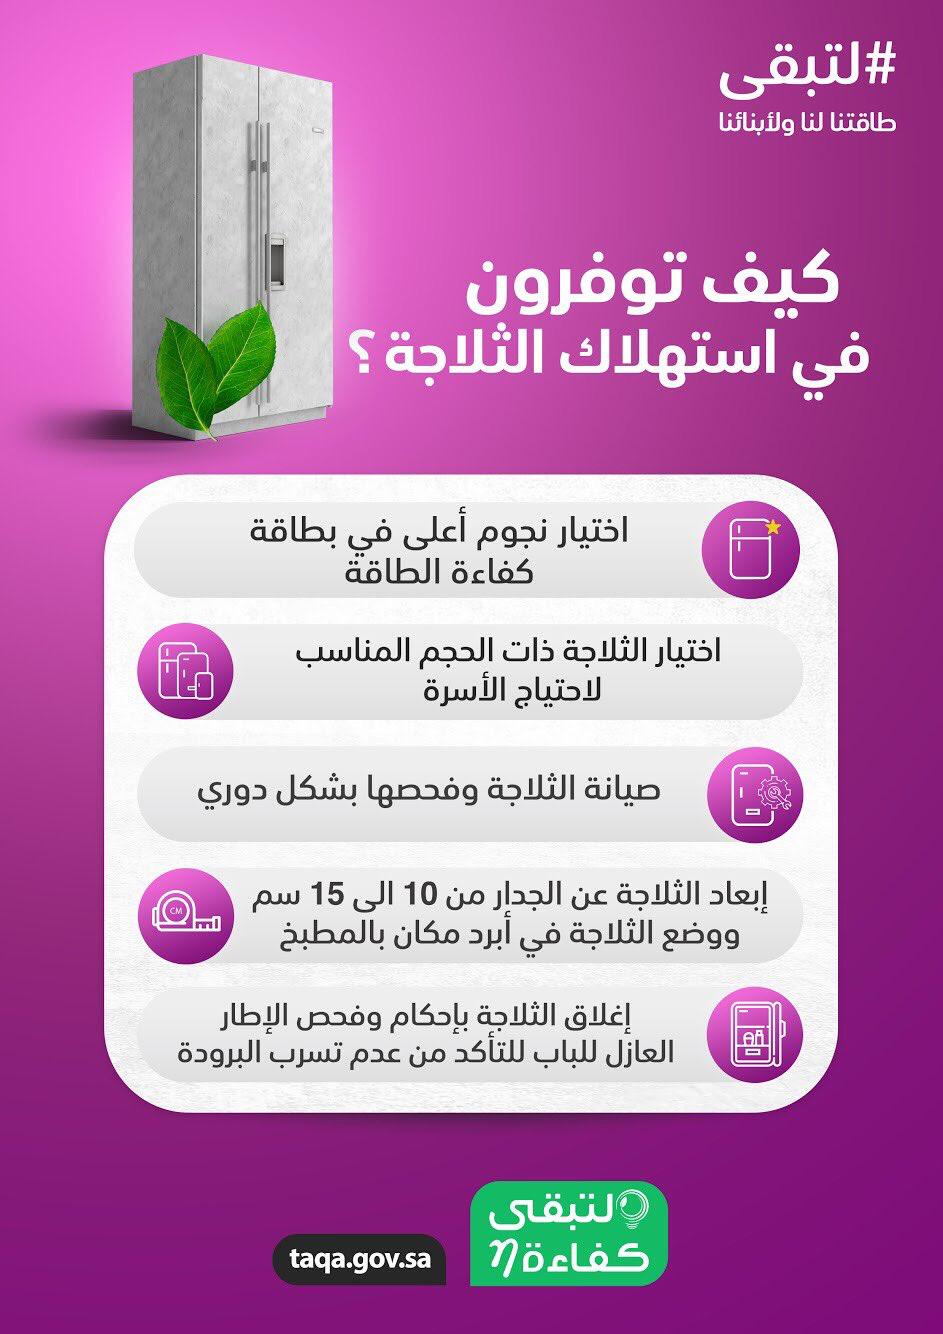 Pin By Wafa On كيفية توفير الكهرباء Ios Ios Messenger